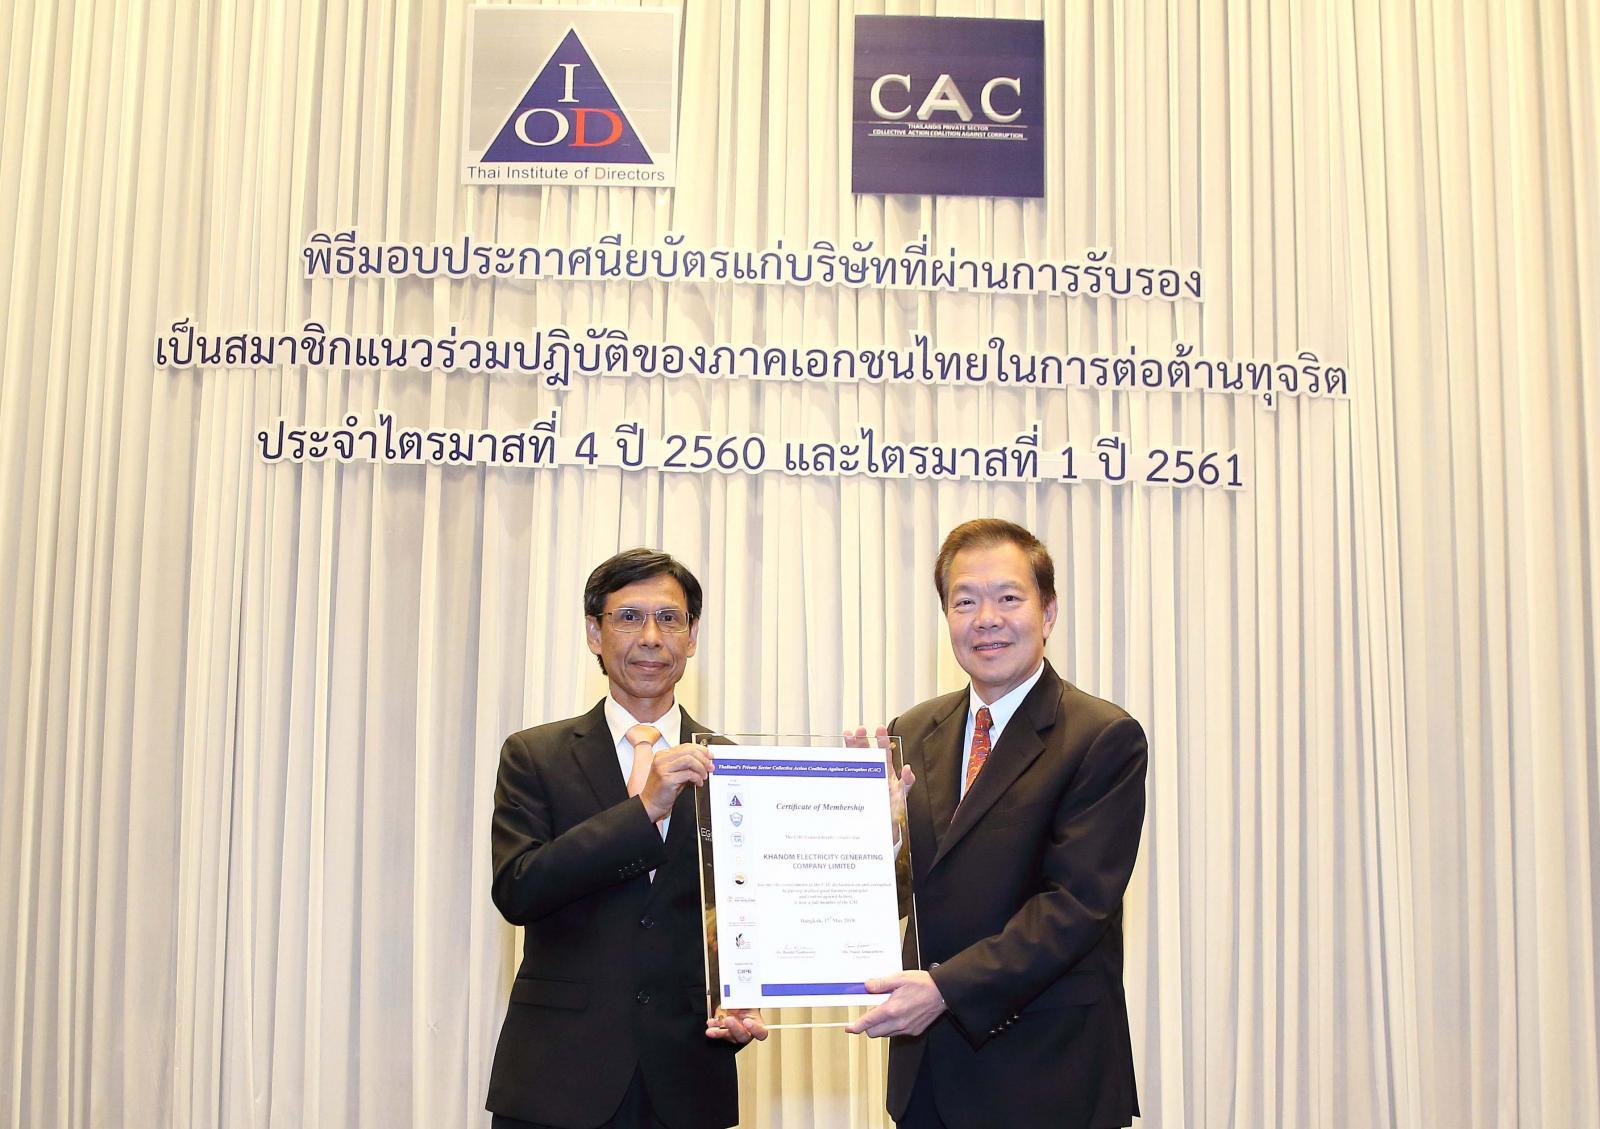 Khanom Power Plant Certified As Cac Membership